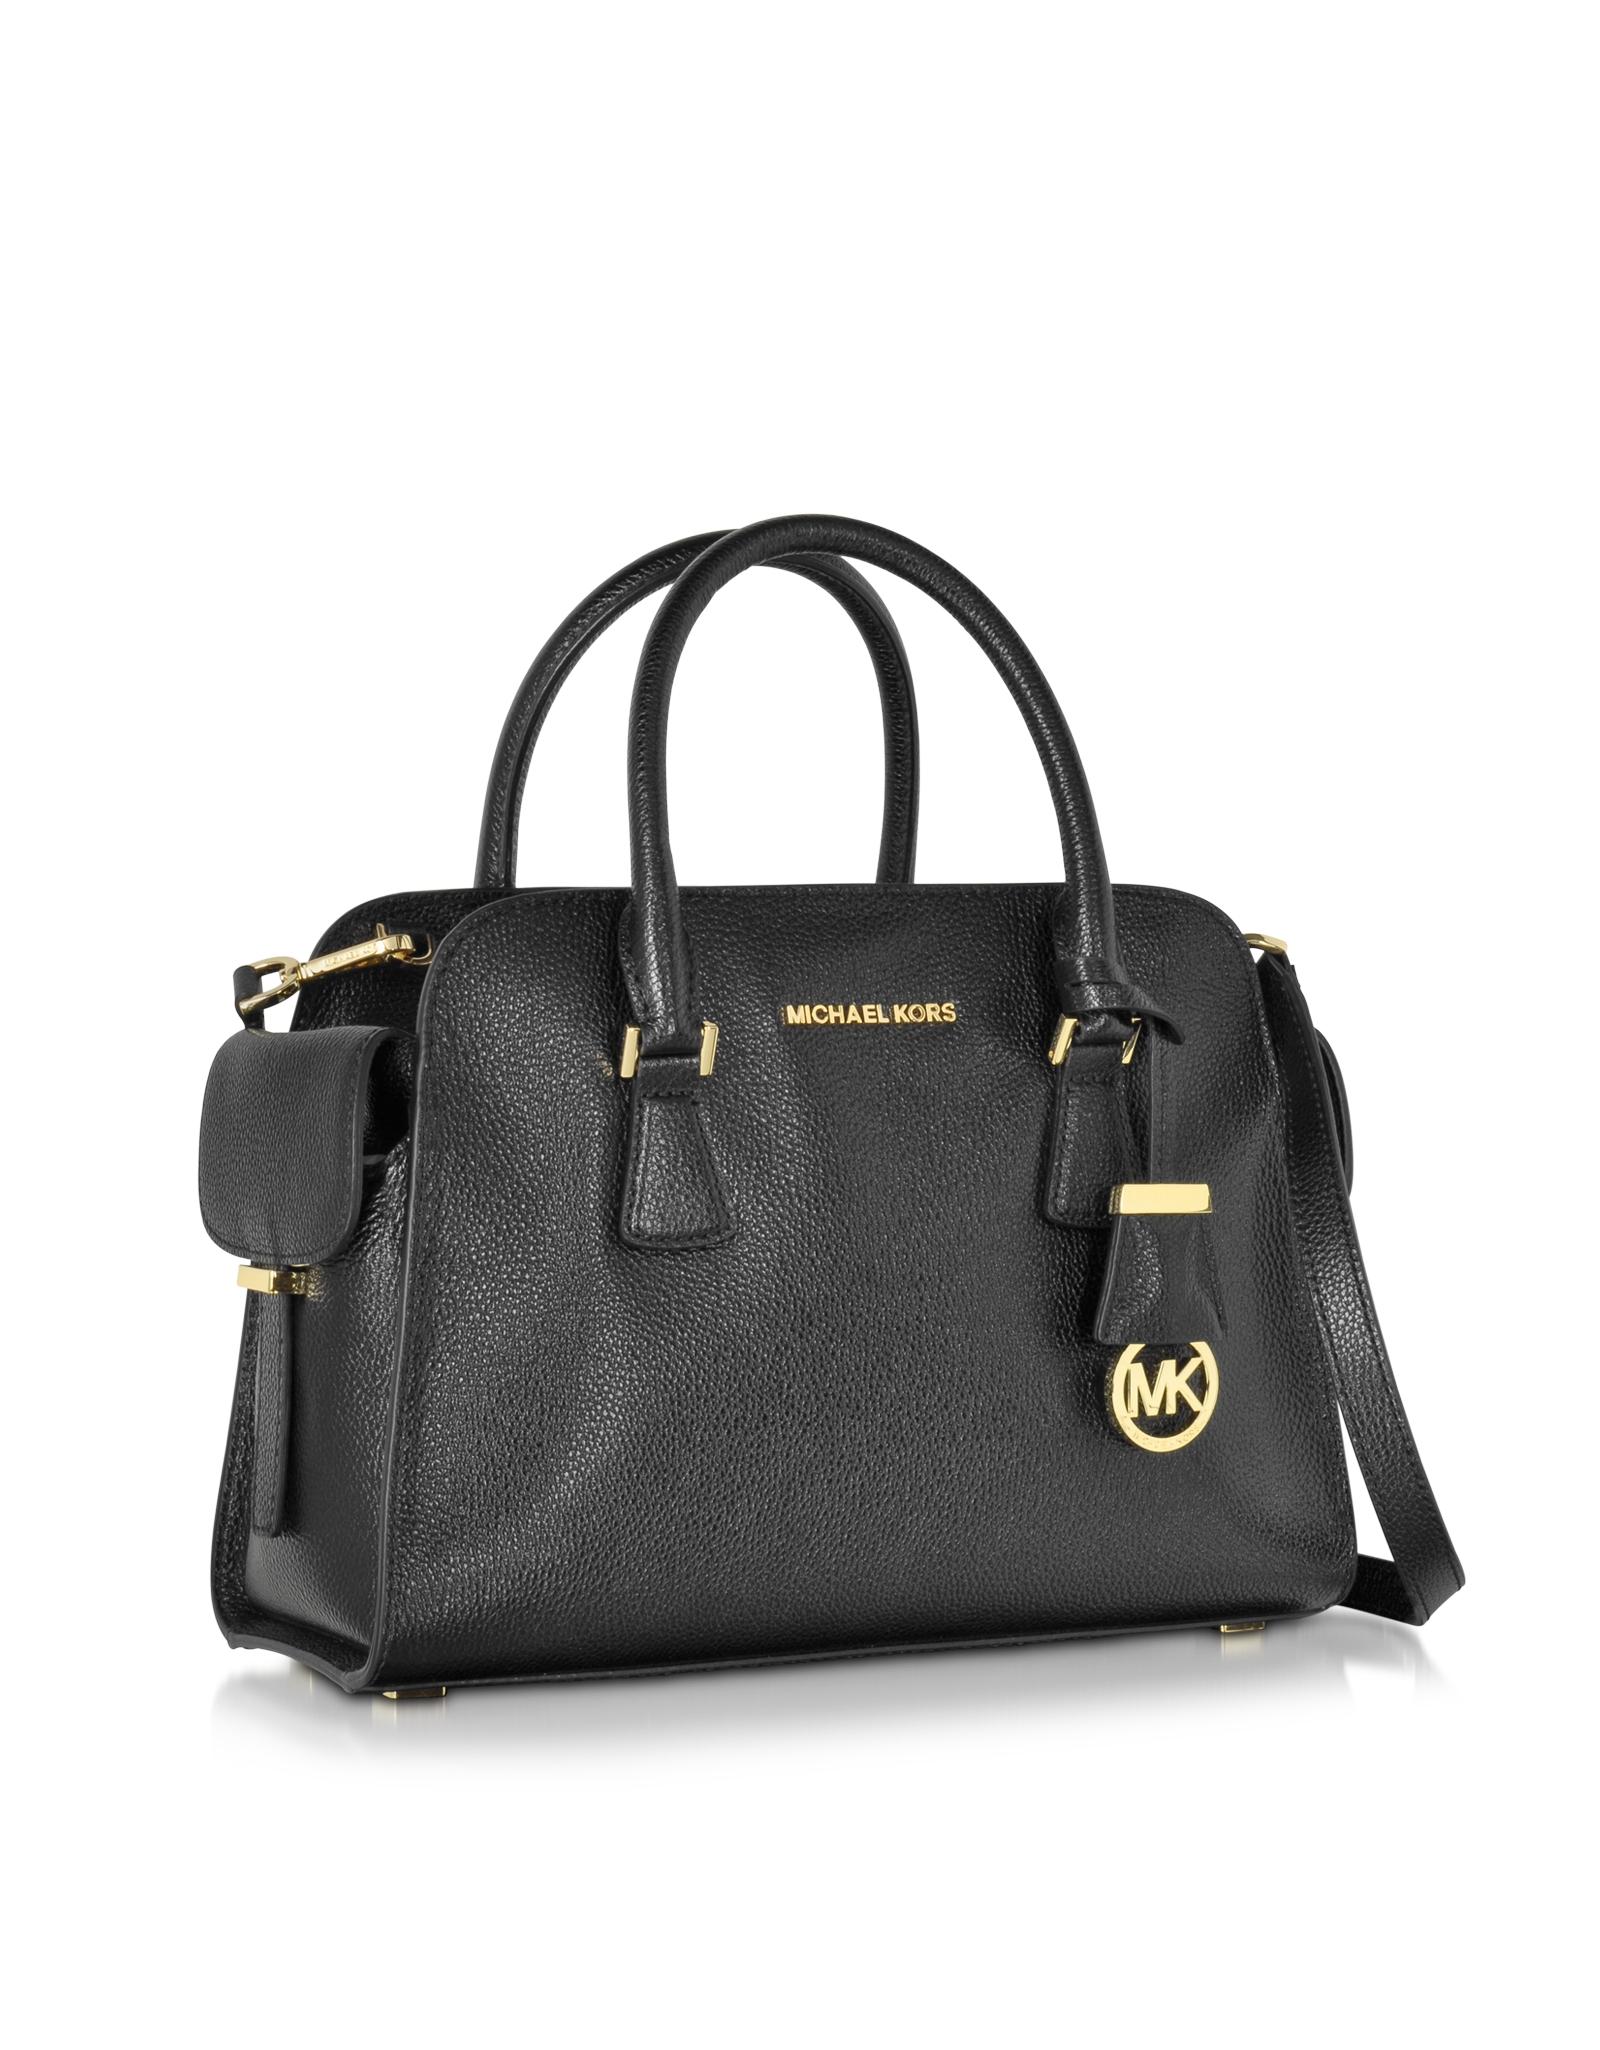 8f5cec6701de Michael Kors Harper Black Glazed Ranch Leather Medium Satchel Bag in ...